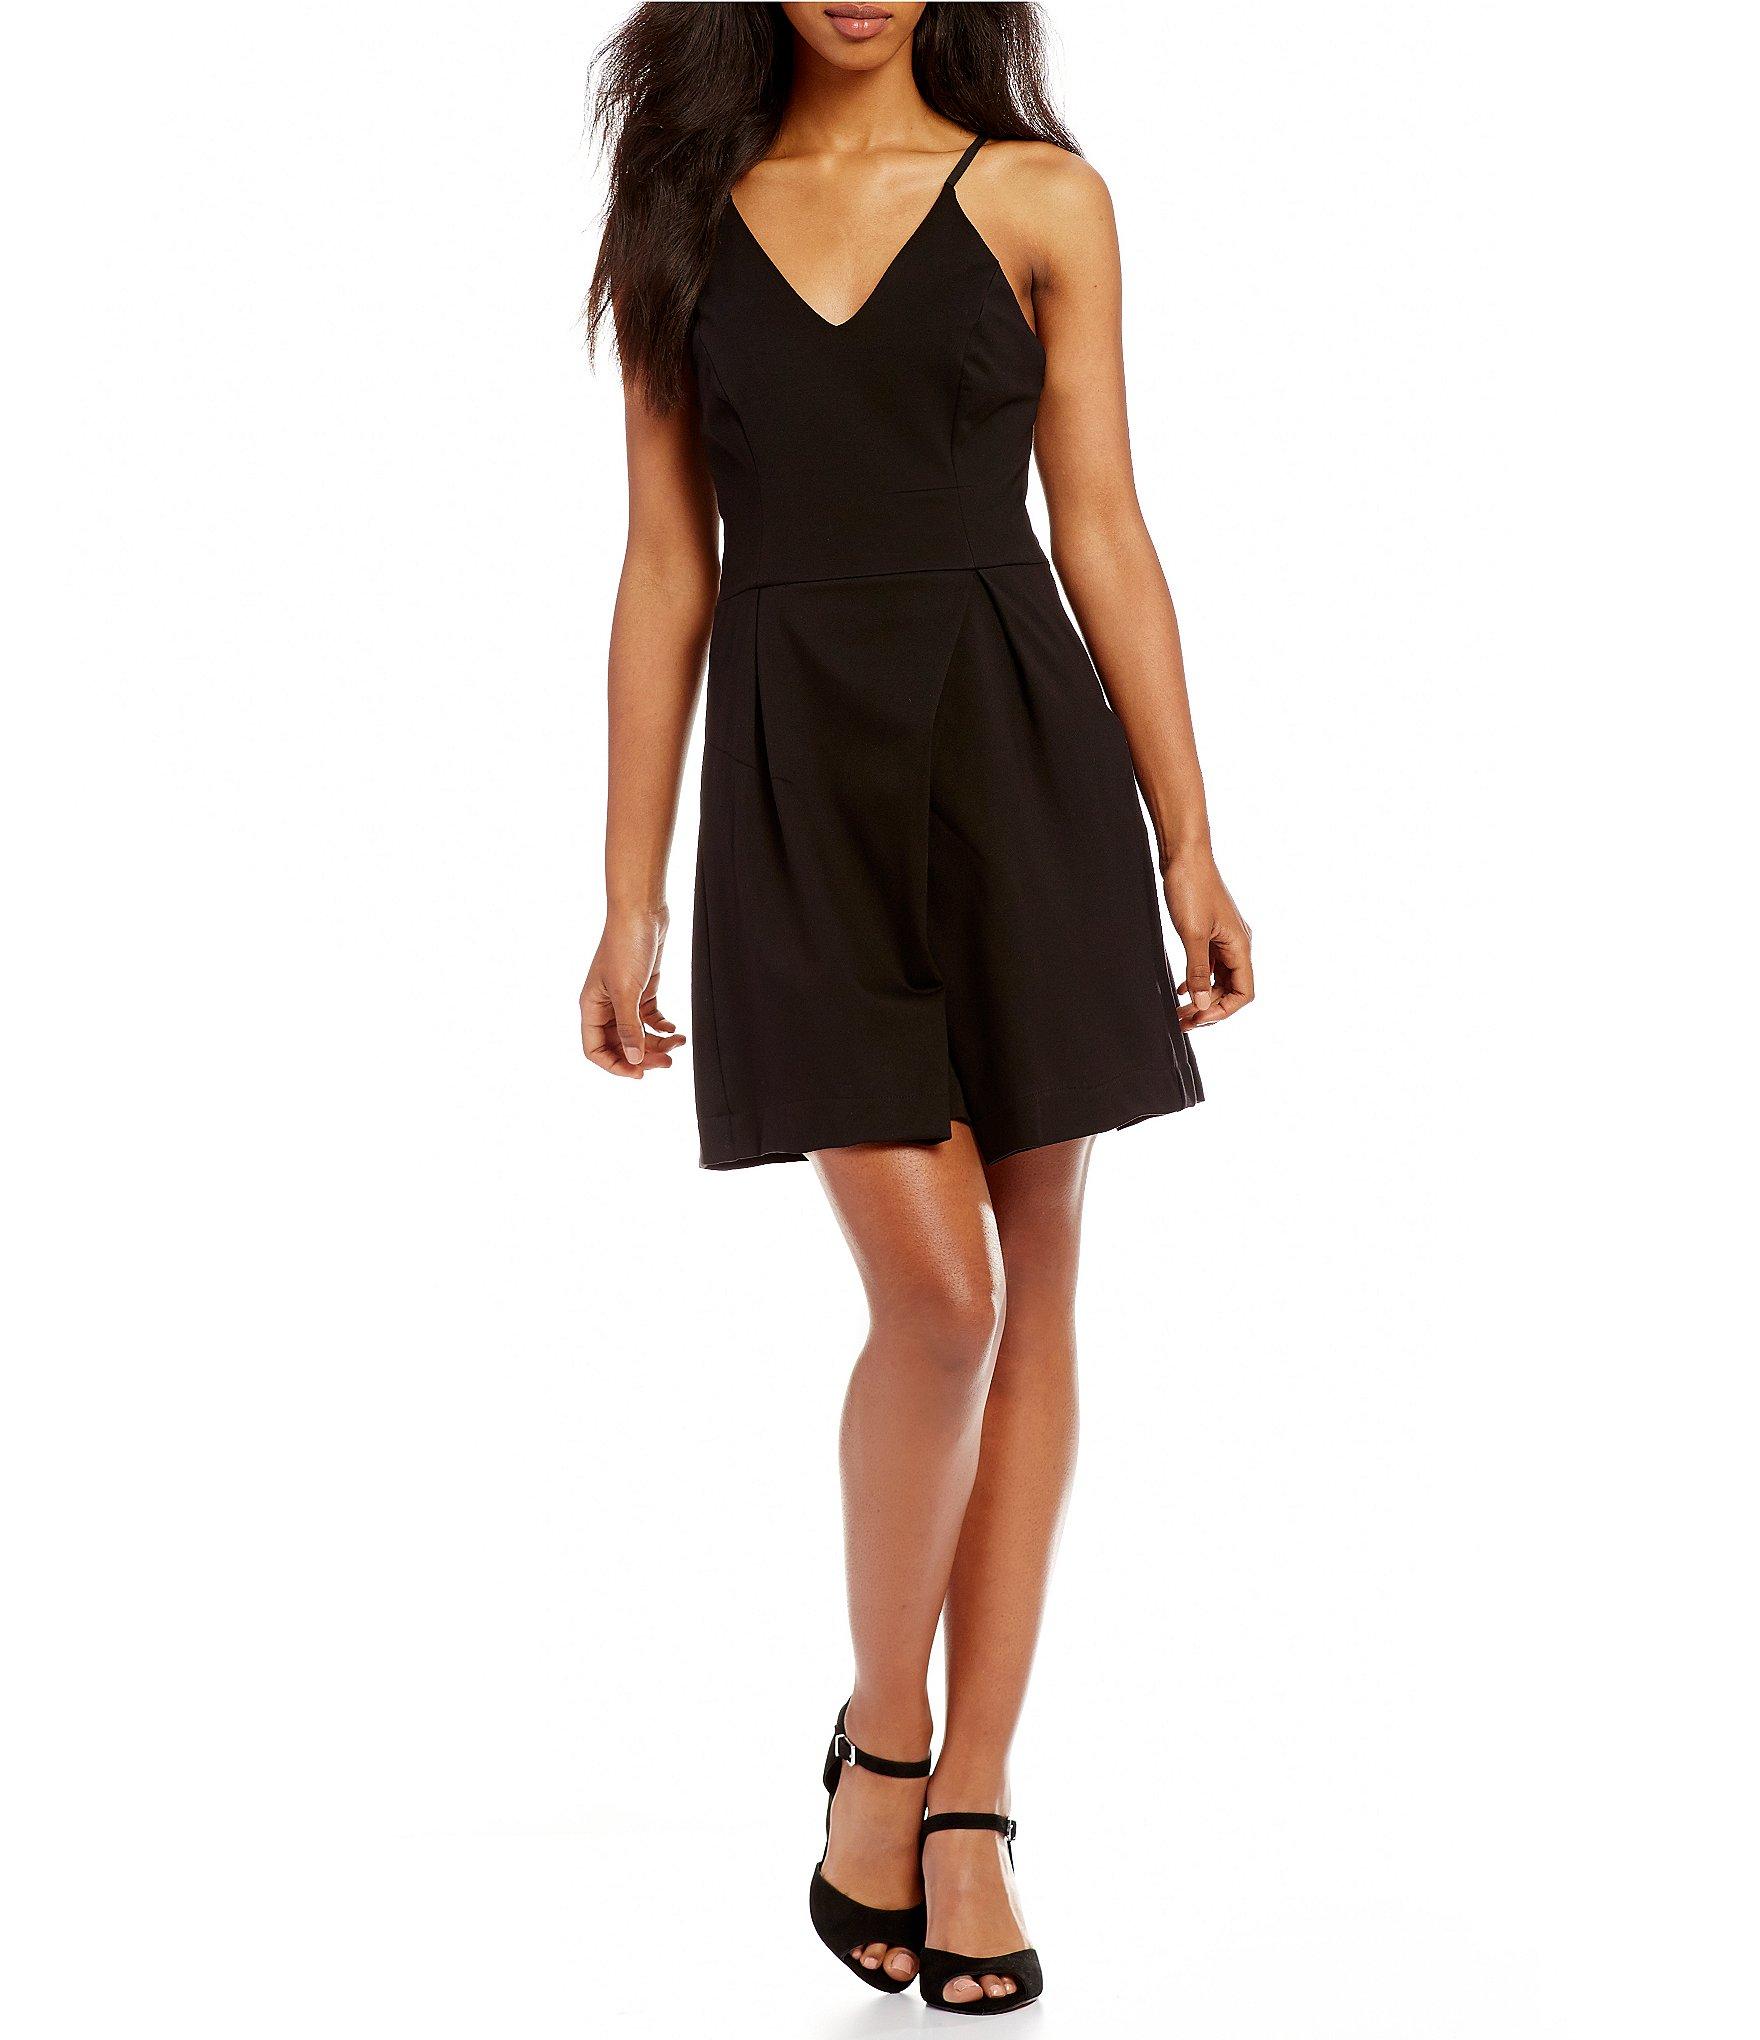 Black dress teenager - Black Dress Teenager 0